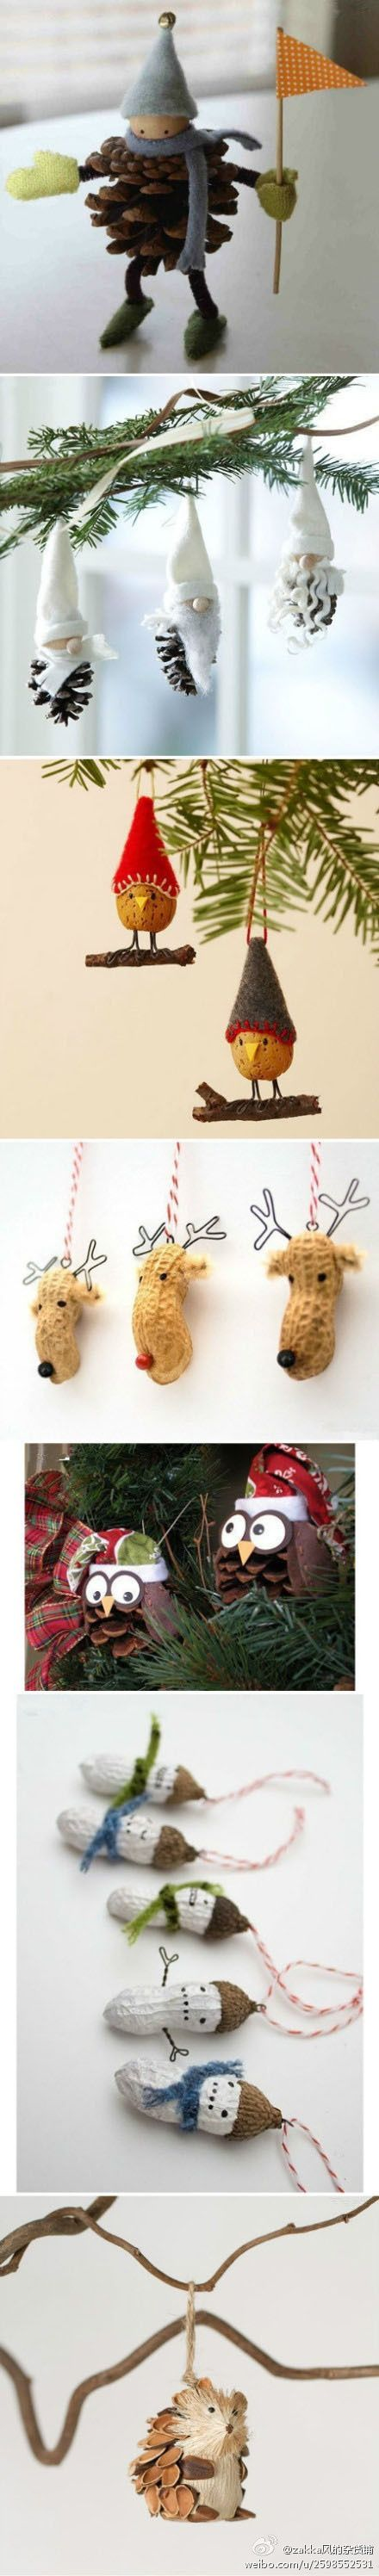 Pine cone decorations for Christmas #DIY #owls #gnomes